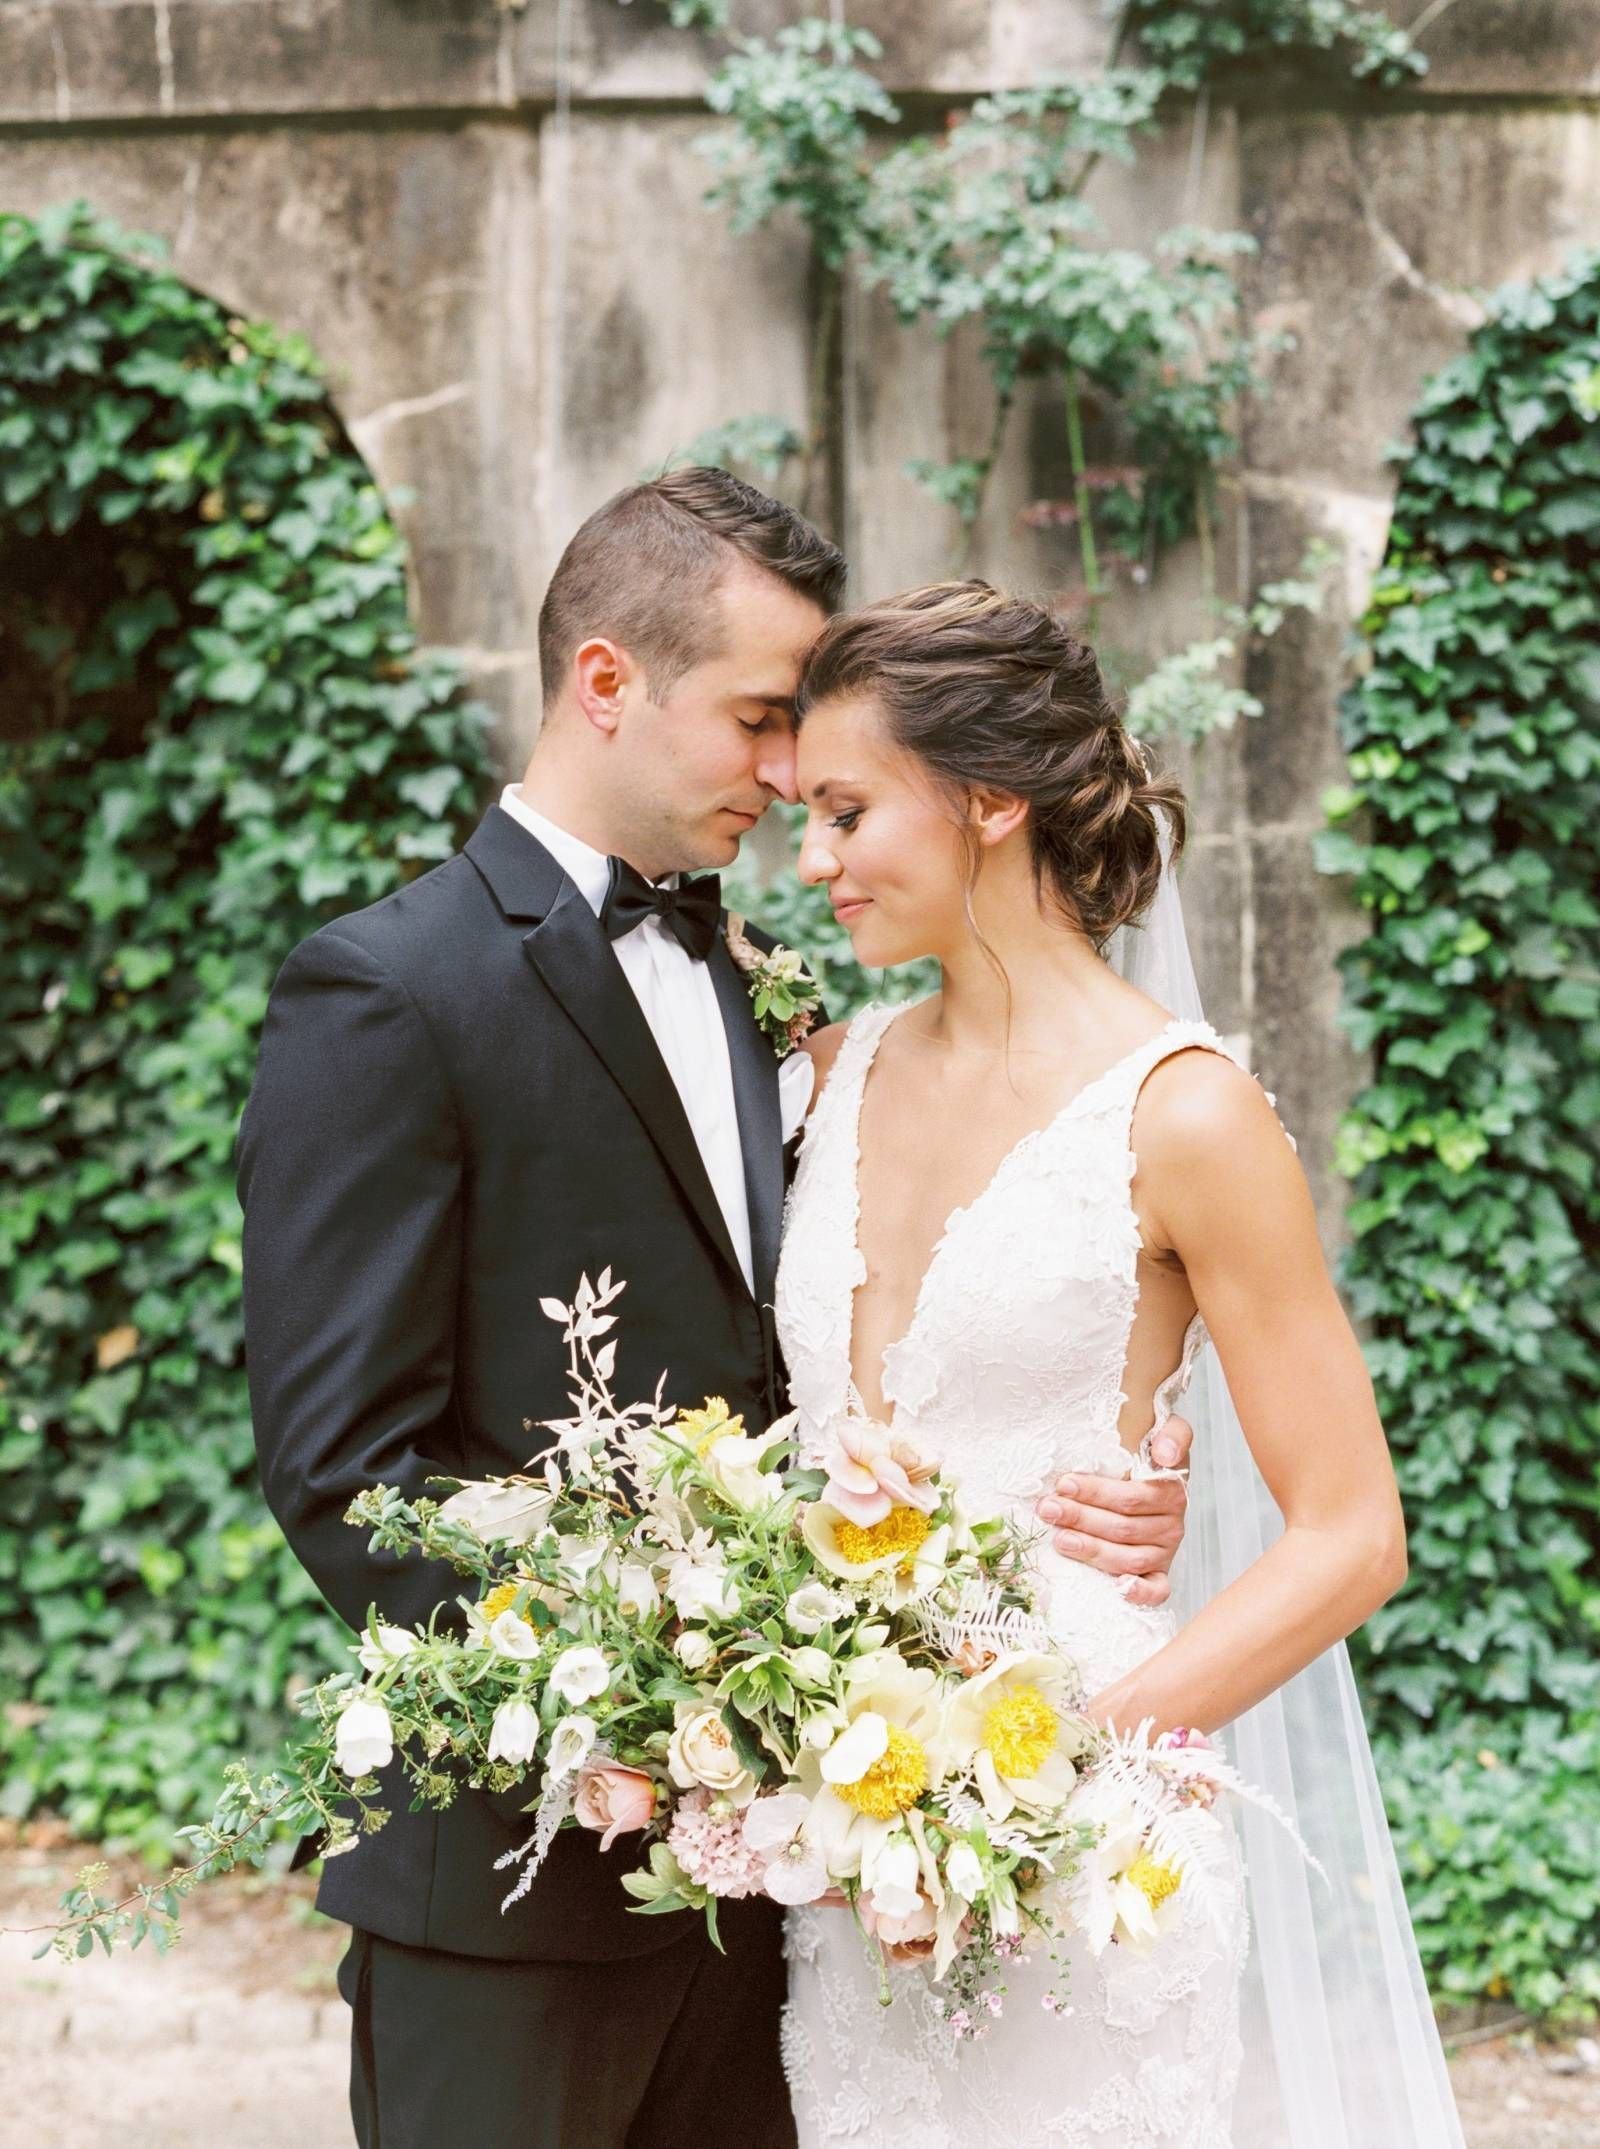 Old world romance wedding inspiration at atlantas swan